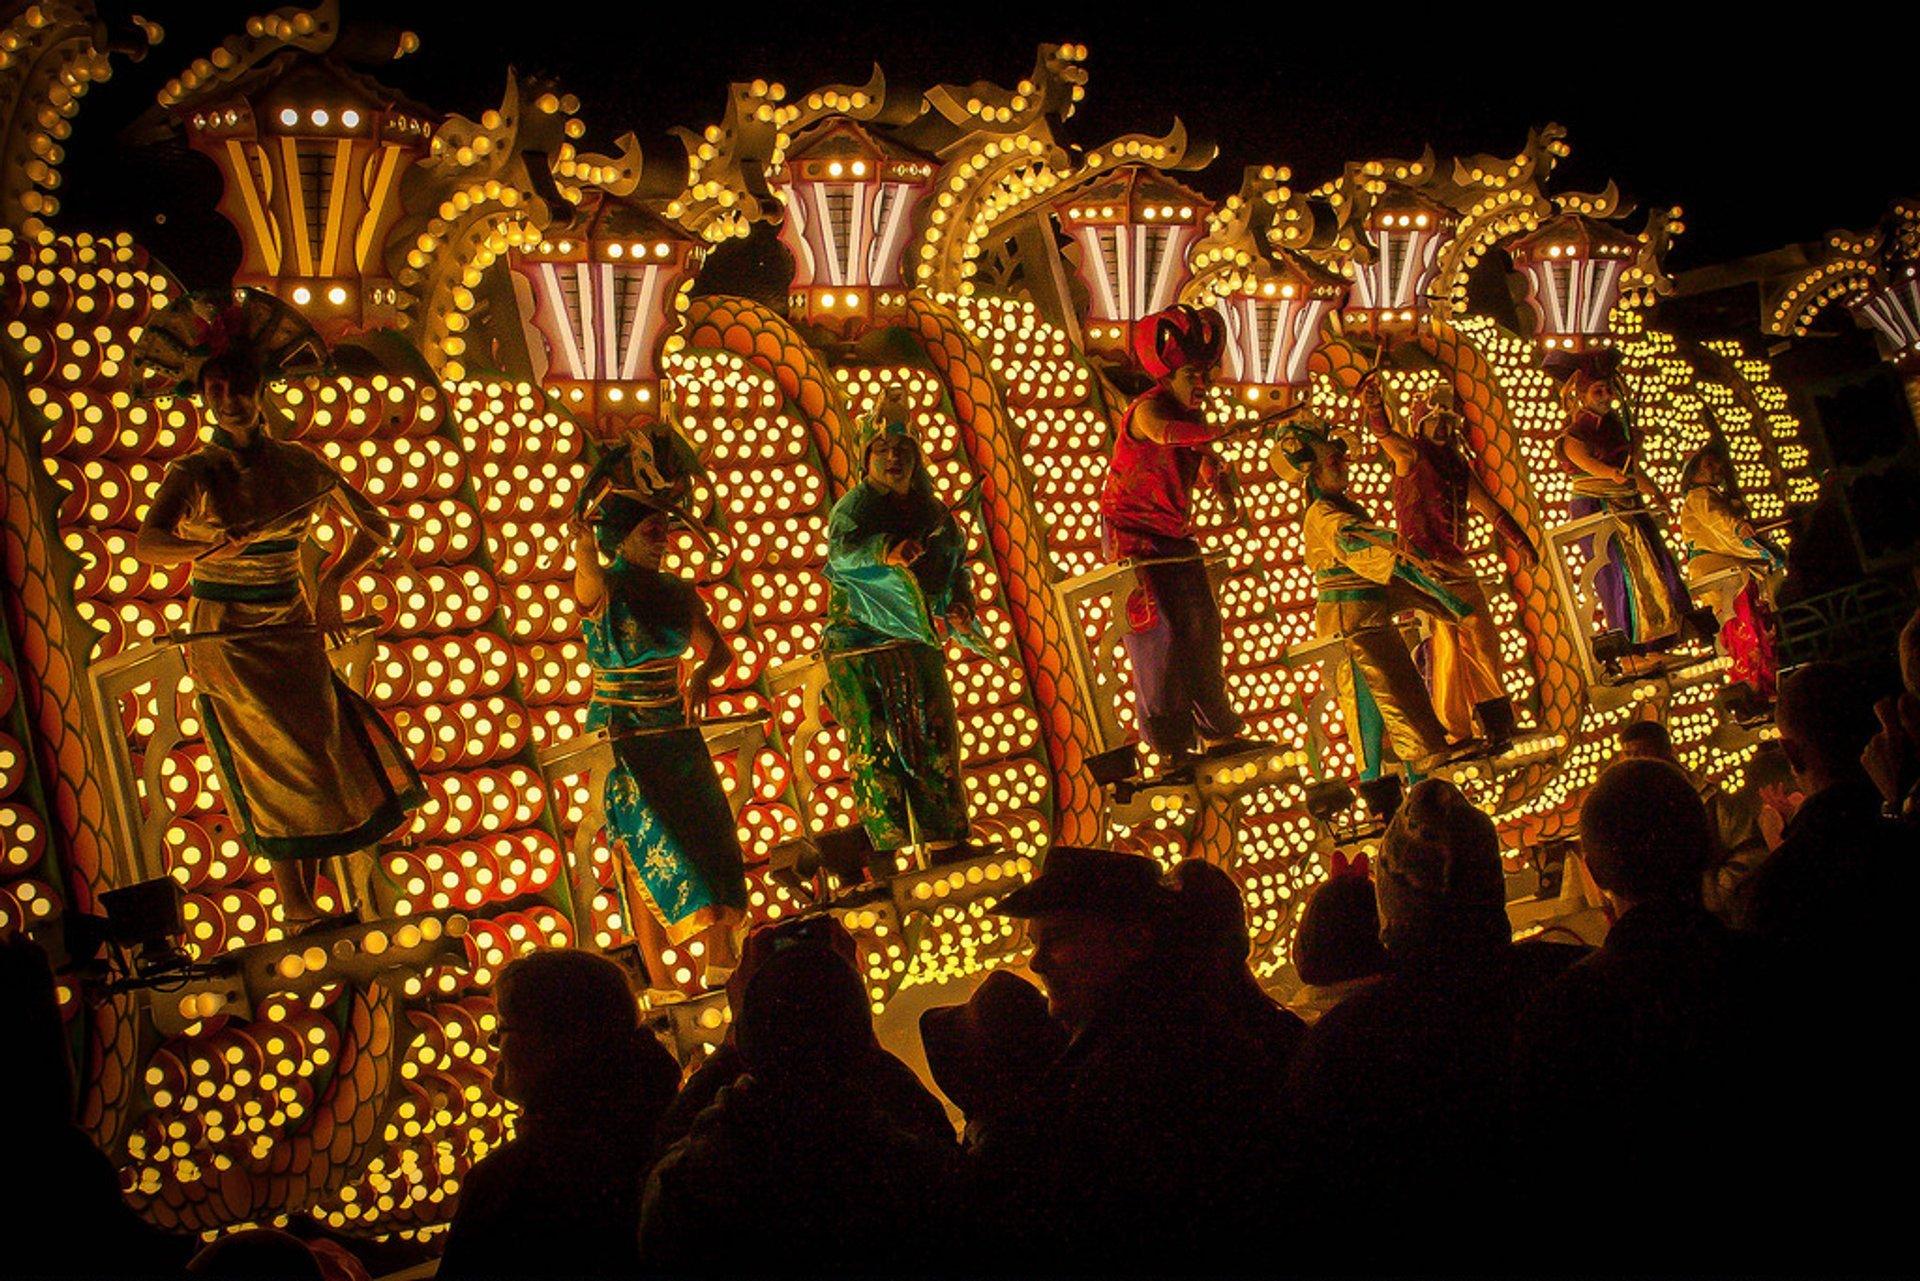 Glastonbury Chilkwell Carnival in England 2020 - Best Time